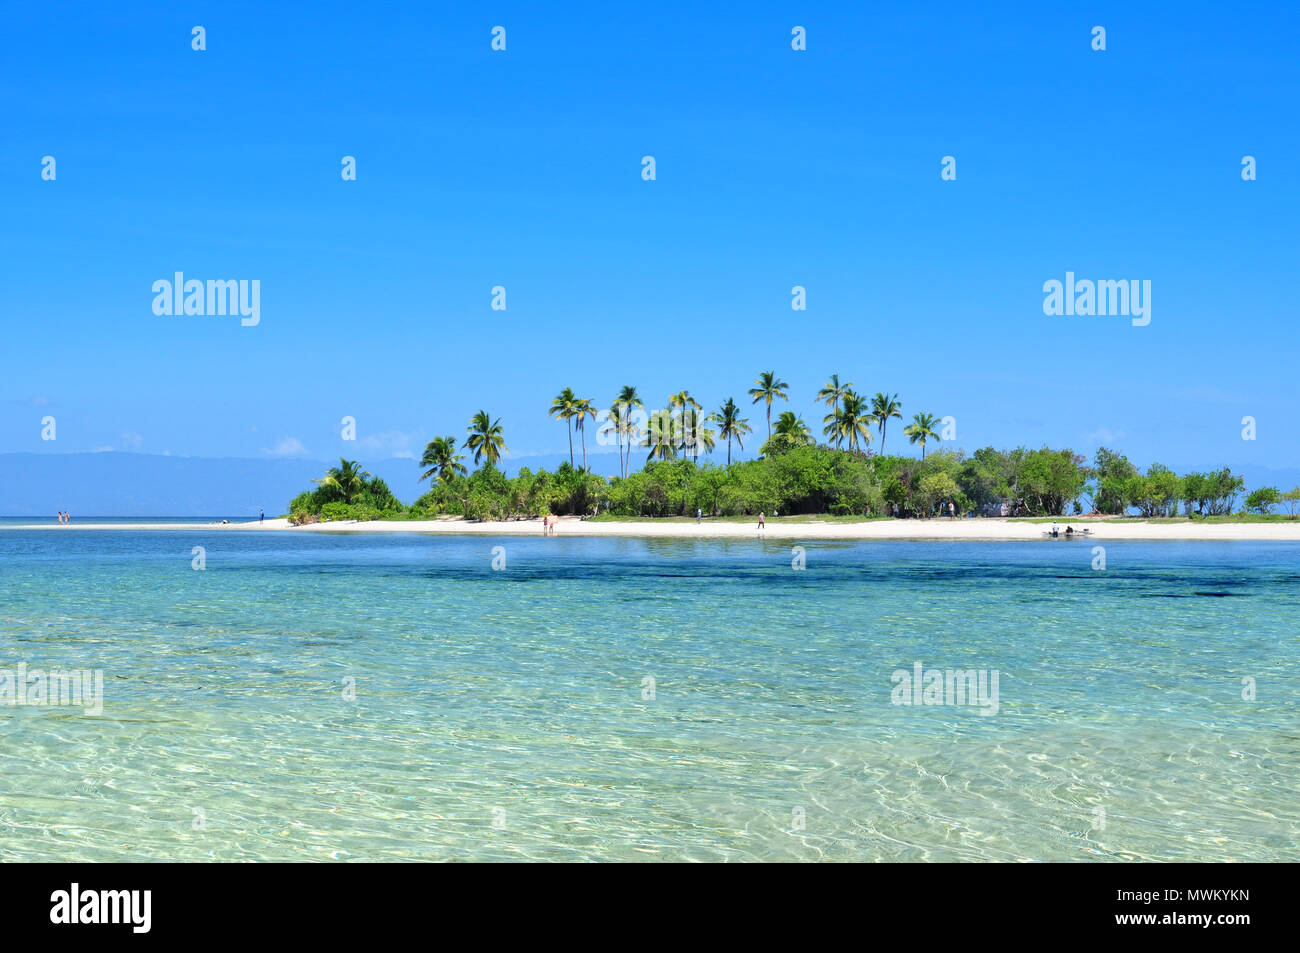 Beautiful pristine tropical island beach. - Stock Image